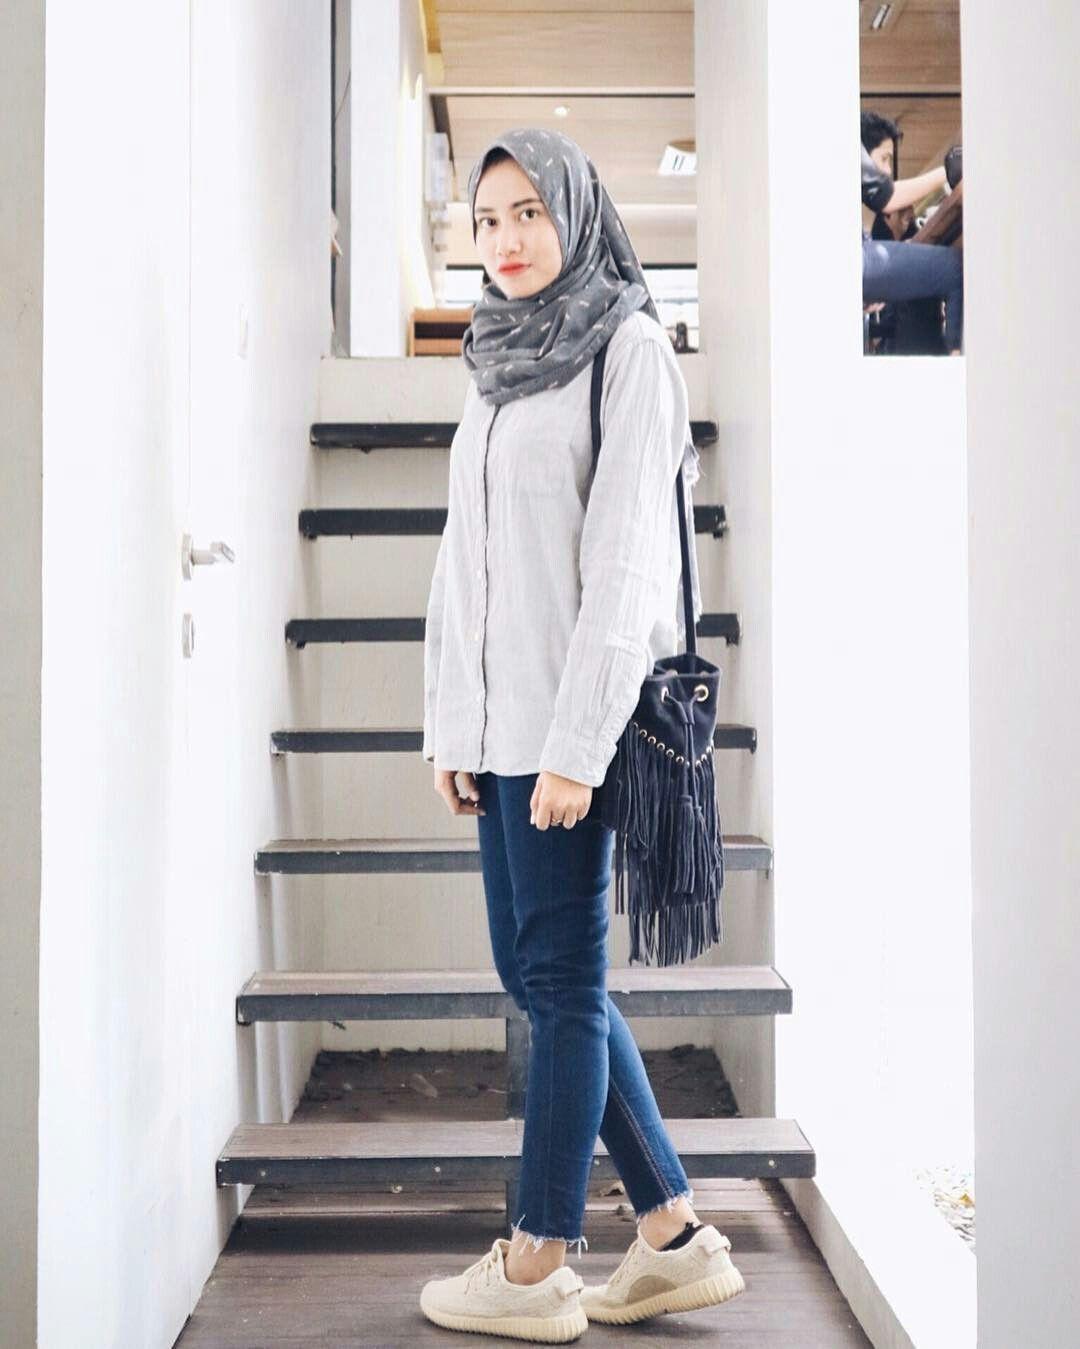 Pin oleh dhiya Cholid di Hijab  Casual hijab outfit, Model